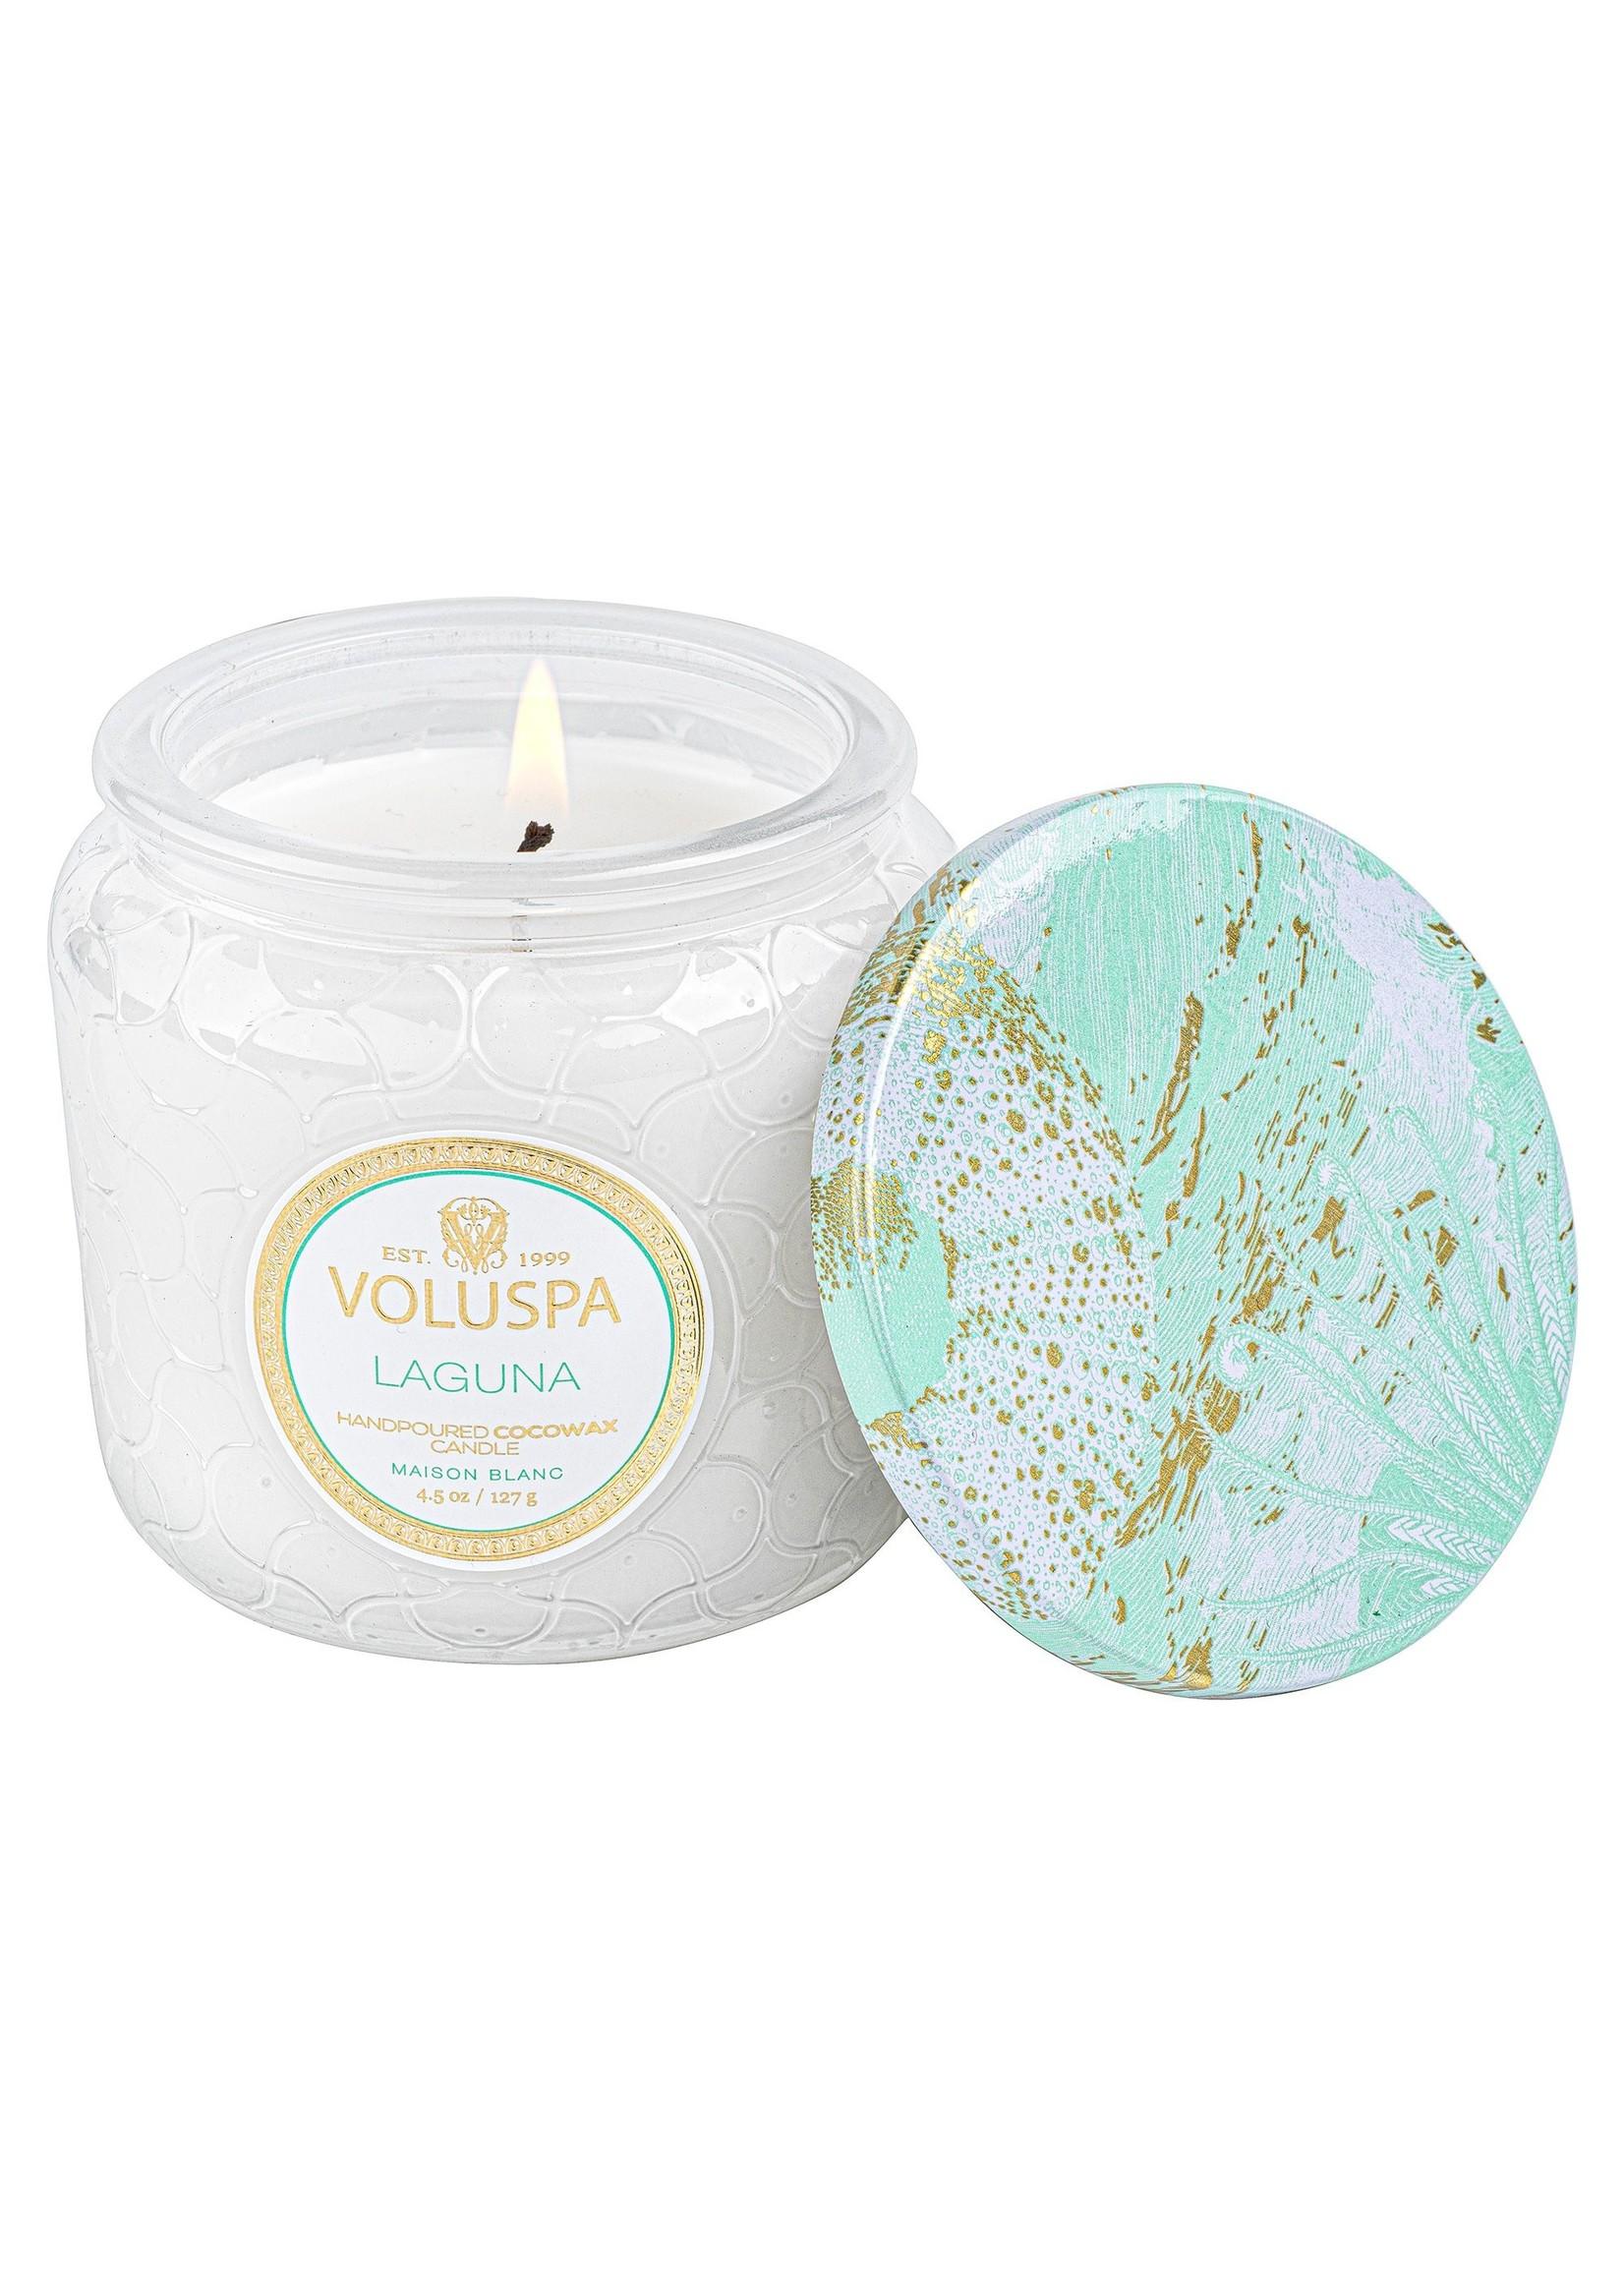 Voluspa Laguna Petite Jar Candle